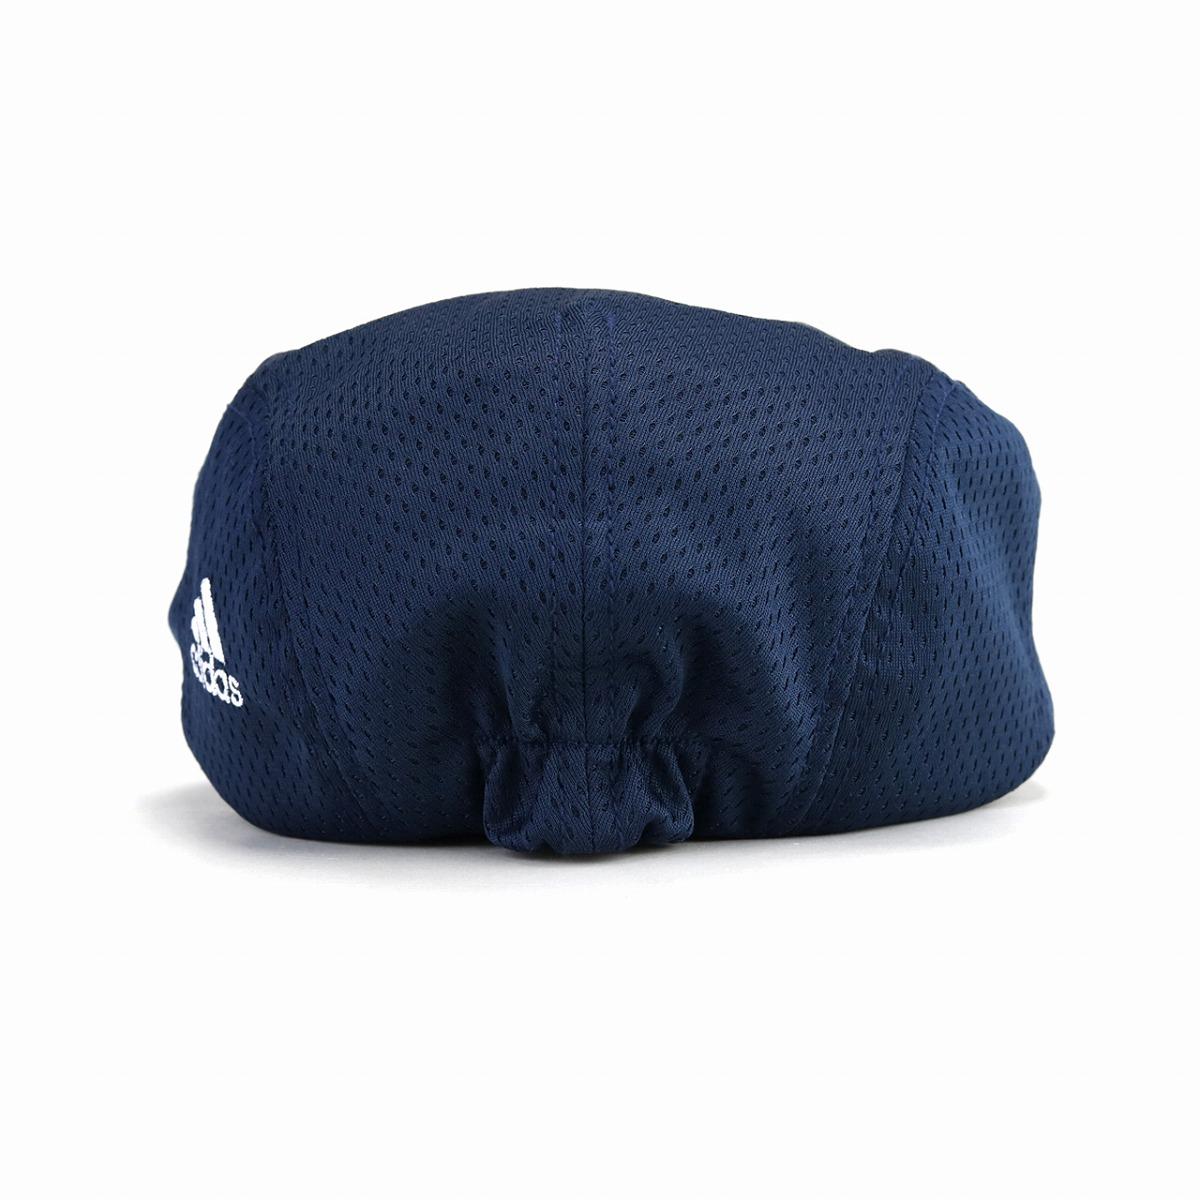 ... adidas sports hunting cap cool hat Adidas mesh hunting cap moisture  absorption fast-dry hunting ... bf21bffd7b3